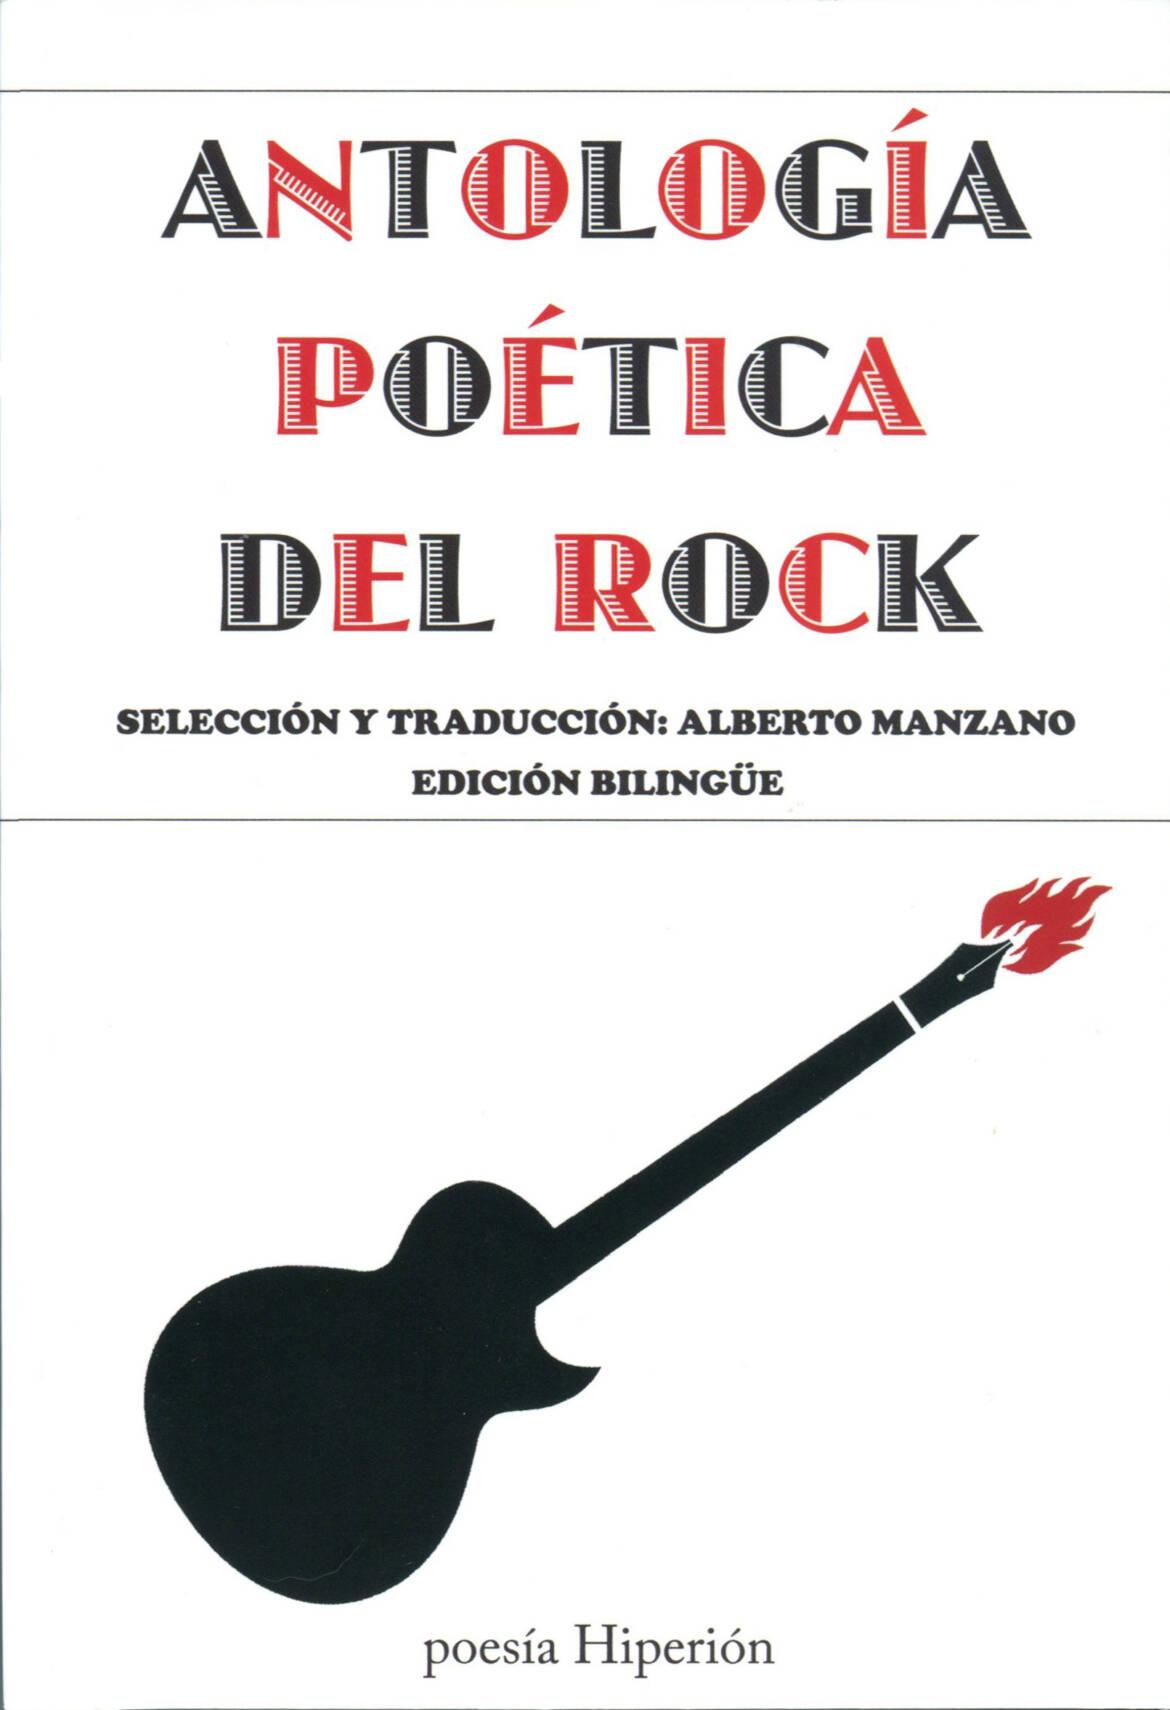 666-antologia-del-rock.jpg